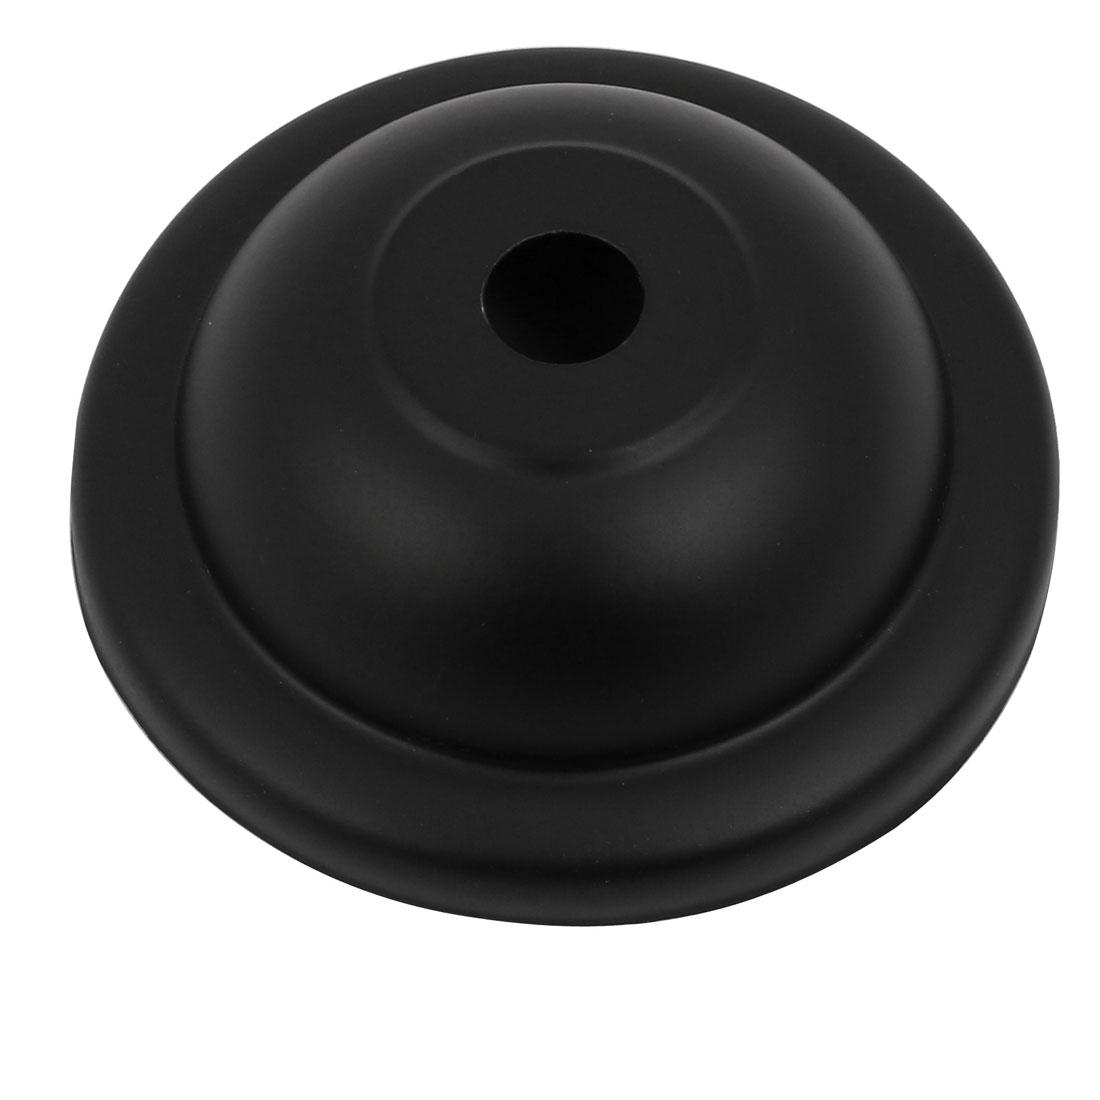 Metal Vintage Hemispherical Ceiling Plate Holder Lamp Disk Chassis Black